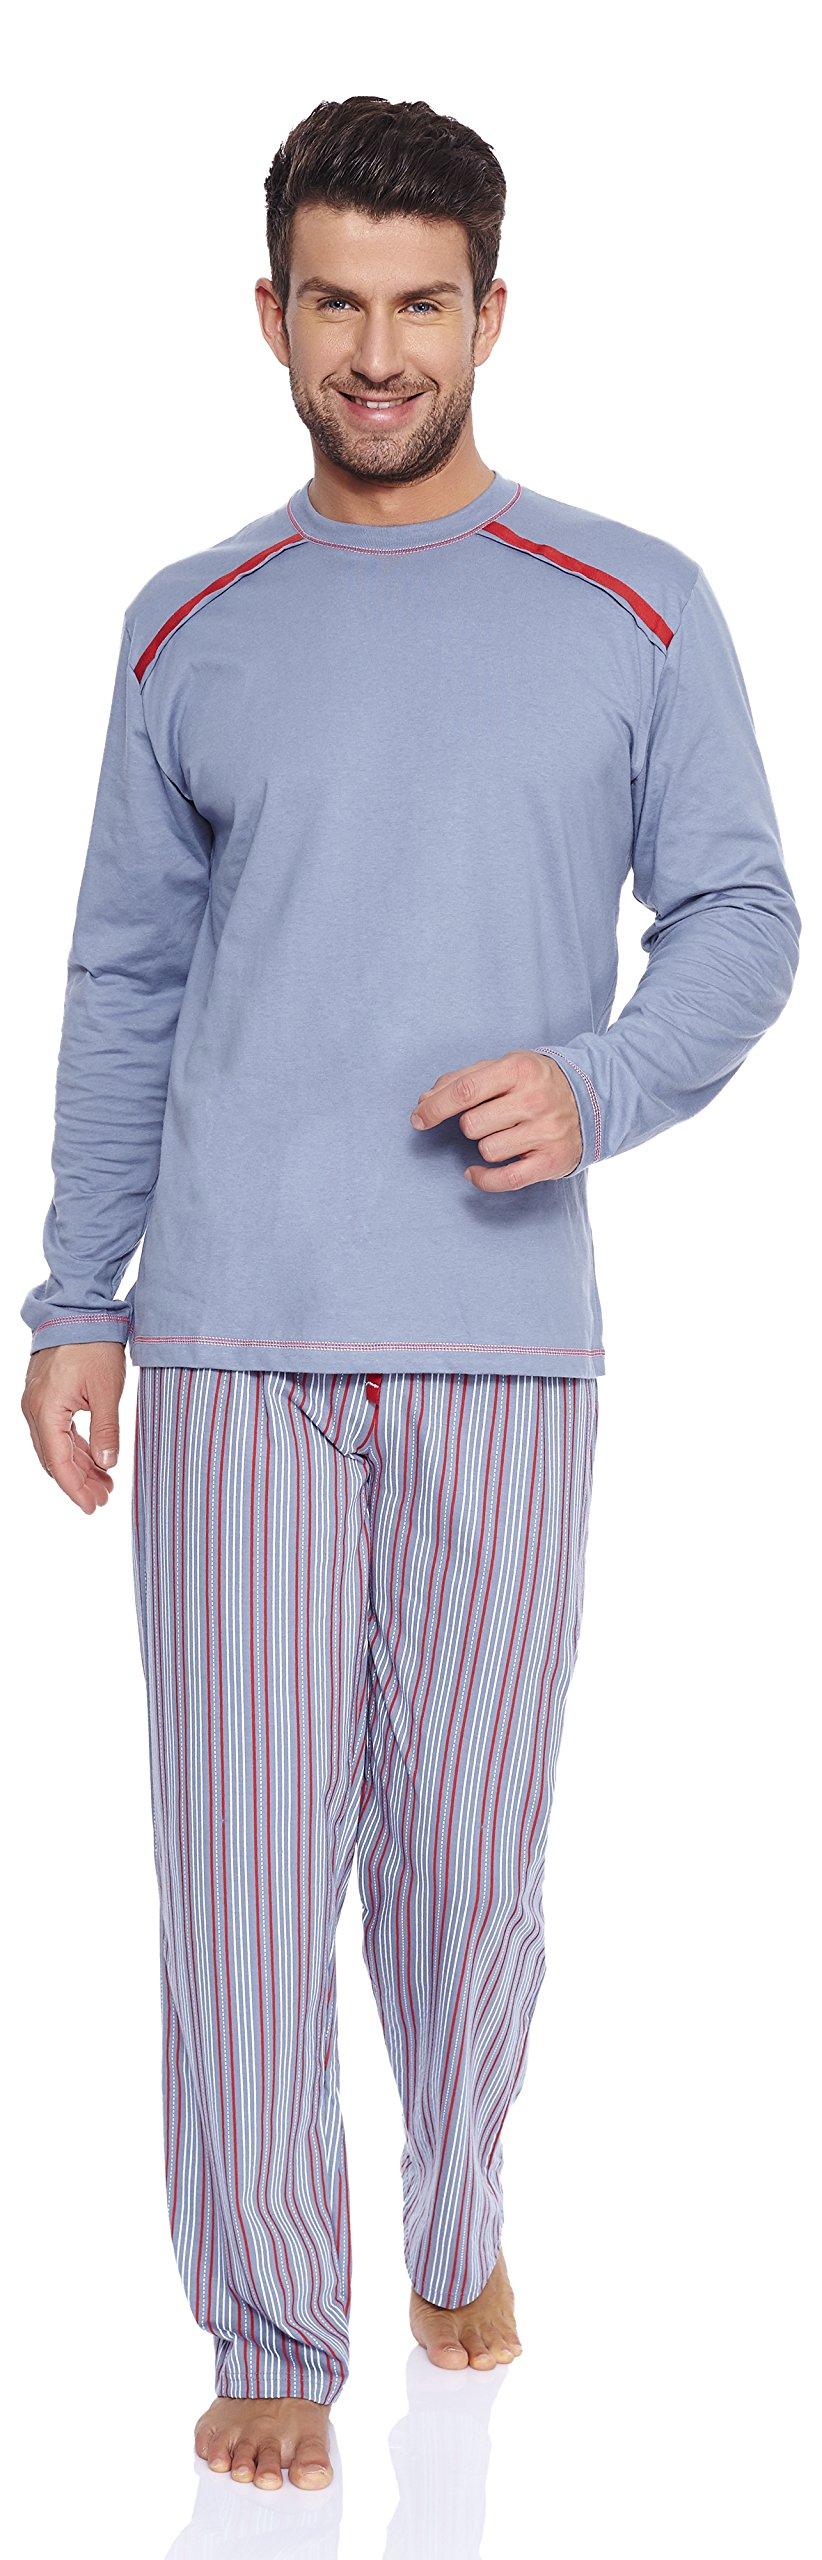 Italian Fashion IF Pijamas para Hombre Alwin 0223 product image